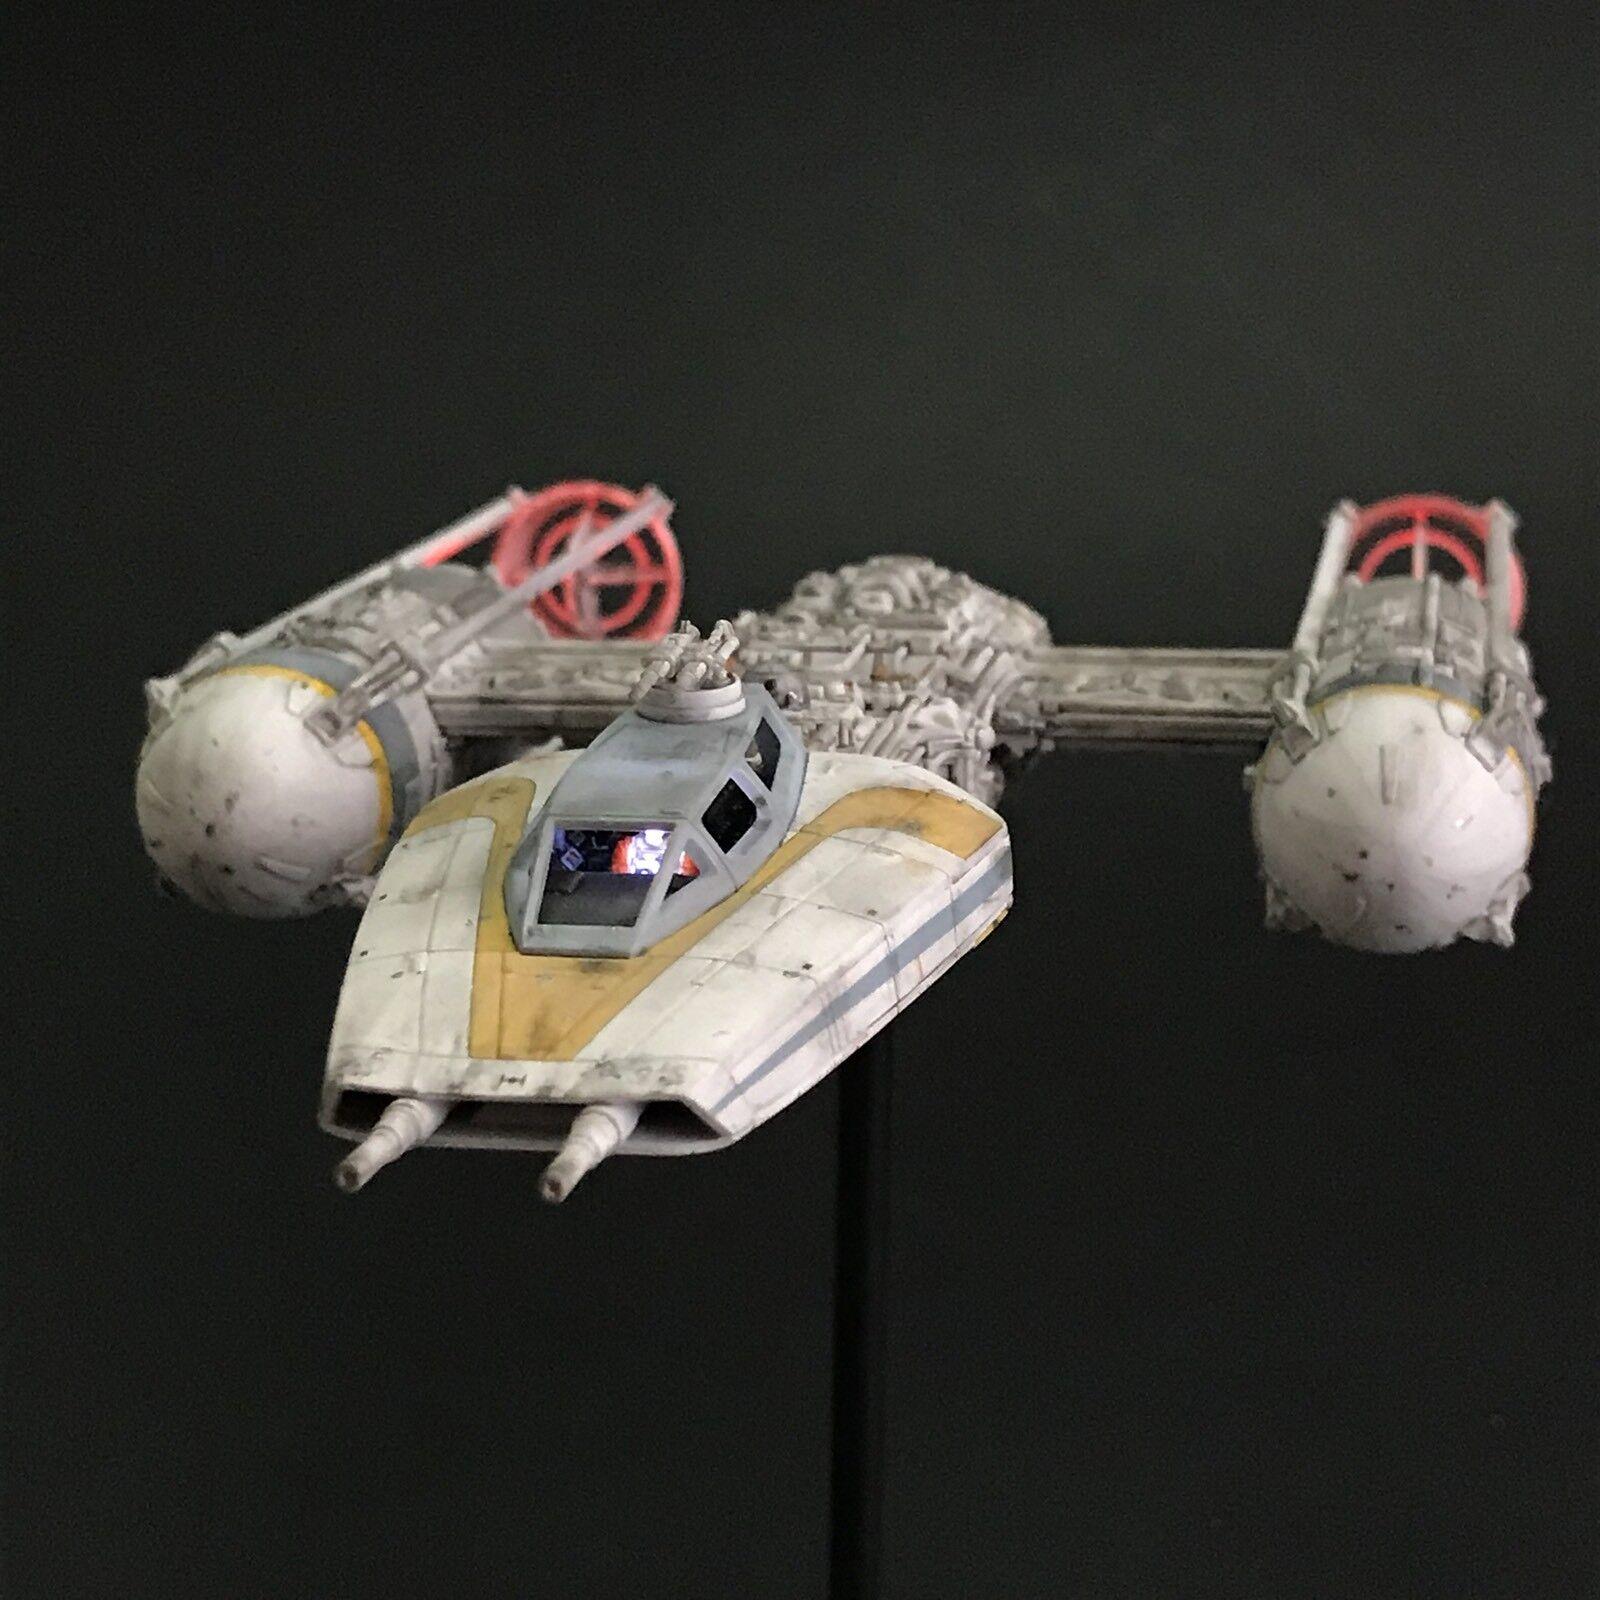 PRO BUILT Rebel Y-Wing Starfighter with FULL LIGHTING Prop Replica Star Wars